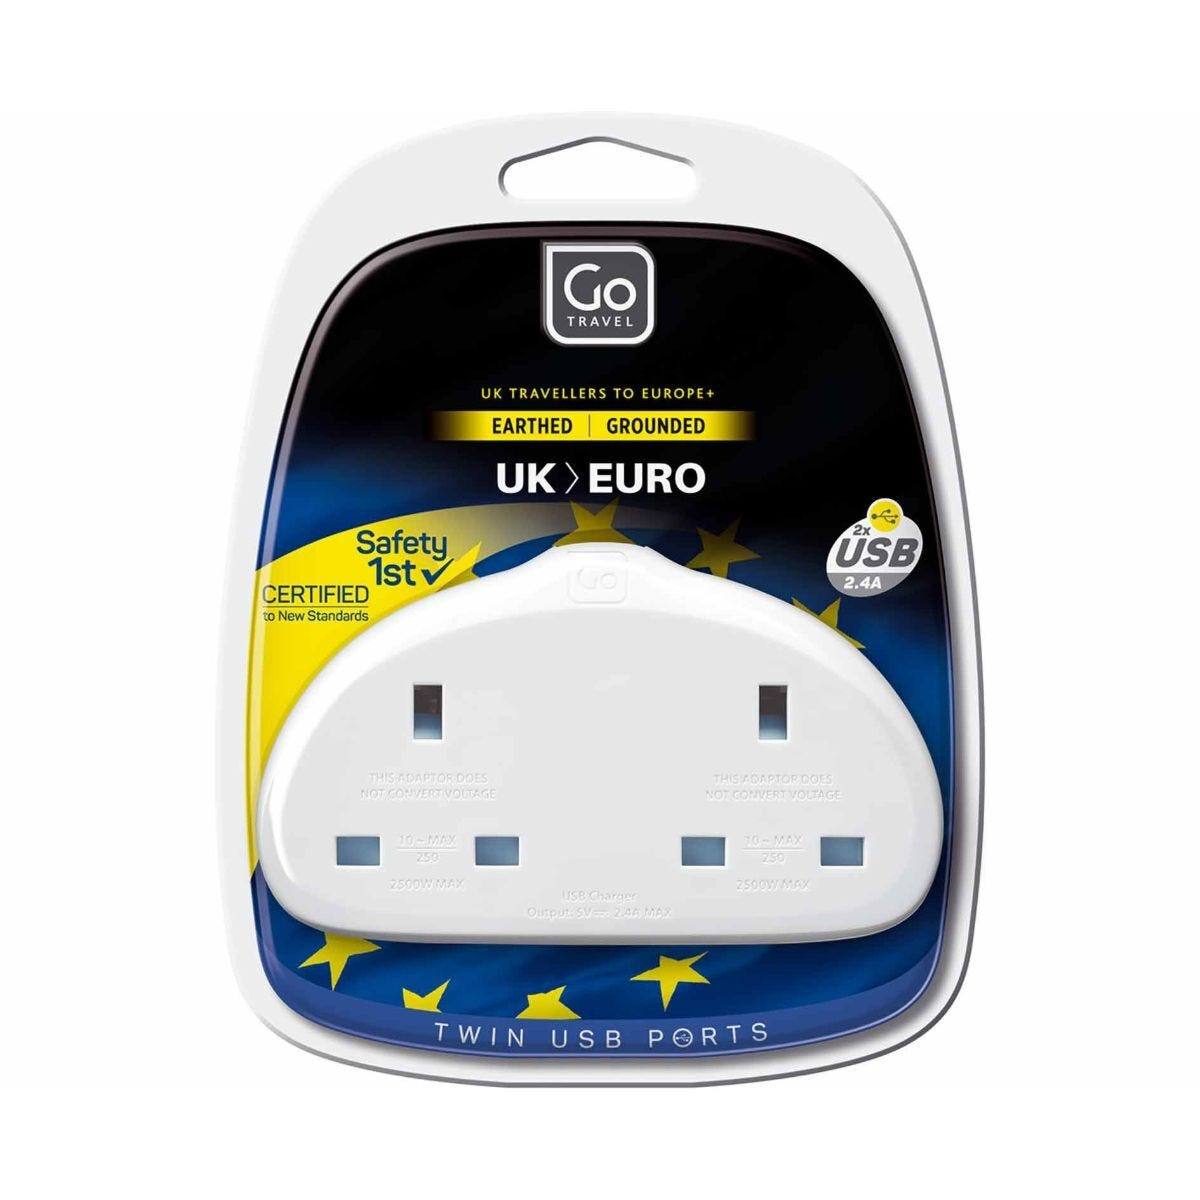 Go Travel UK to EU Duo Plus USB Plug Adaptor